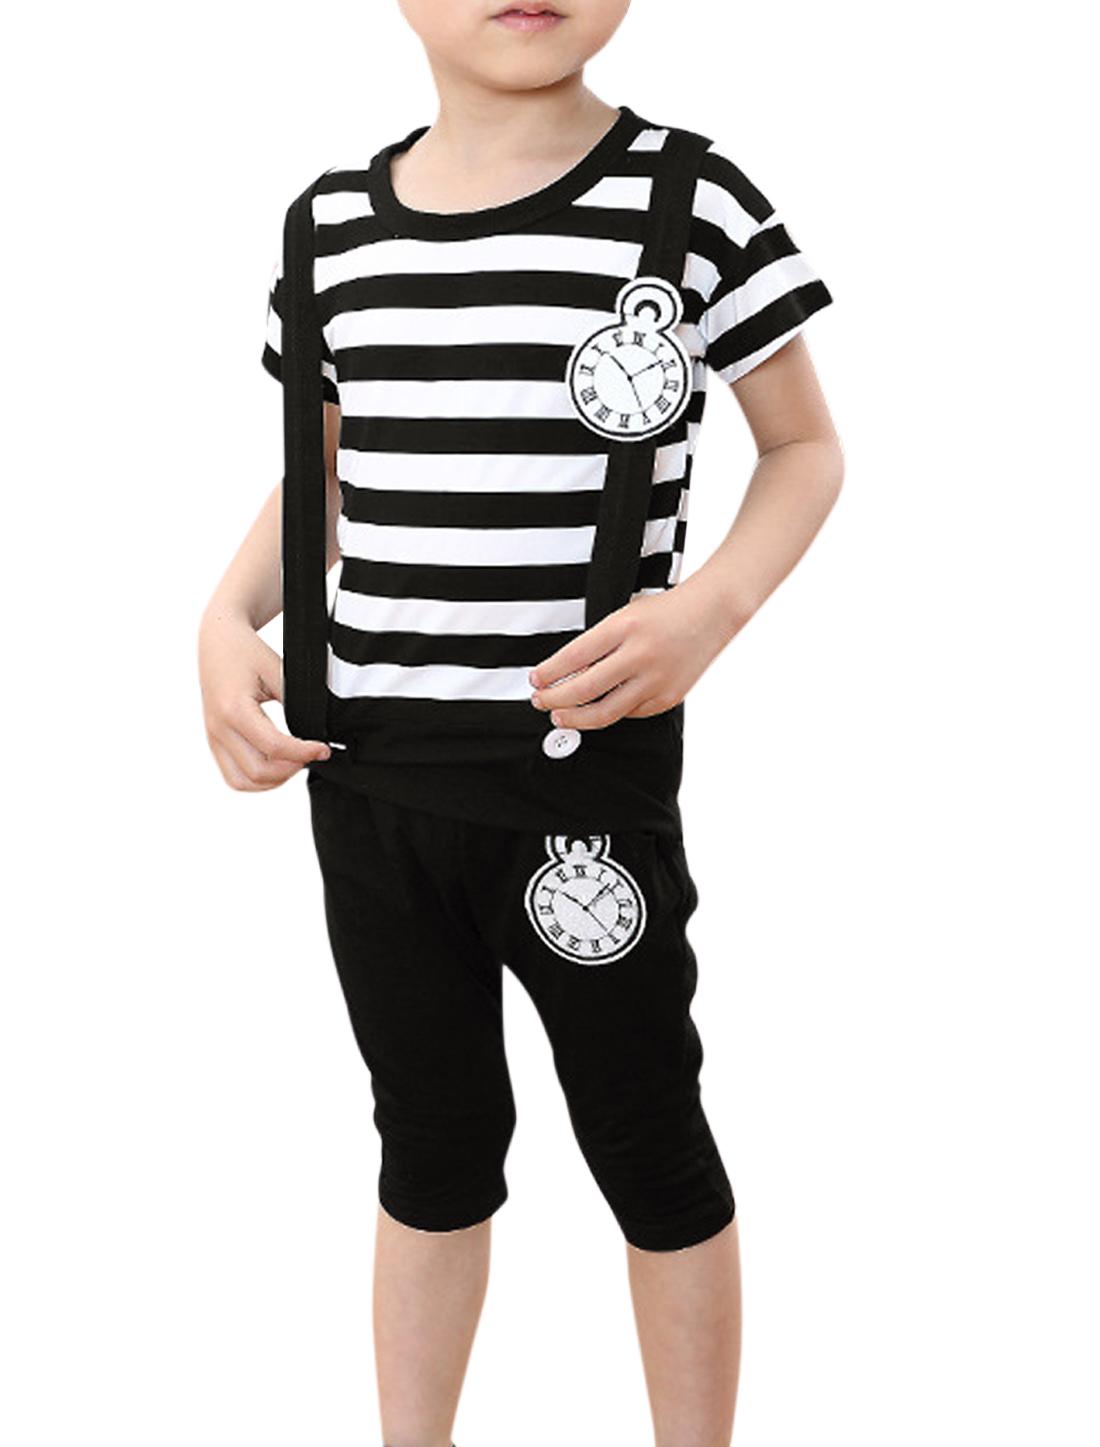 Unisex Striped Top w Leisure Capris Pants Black White Girls Boys 5